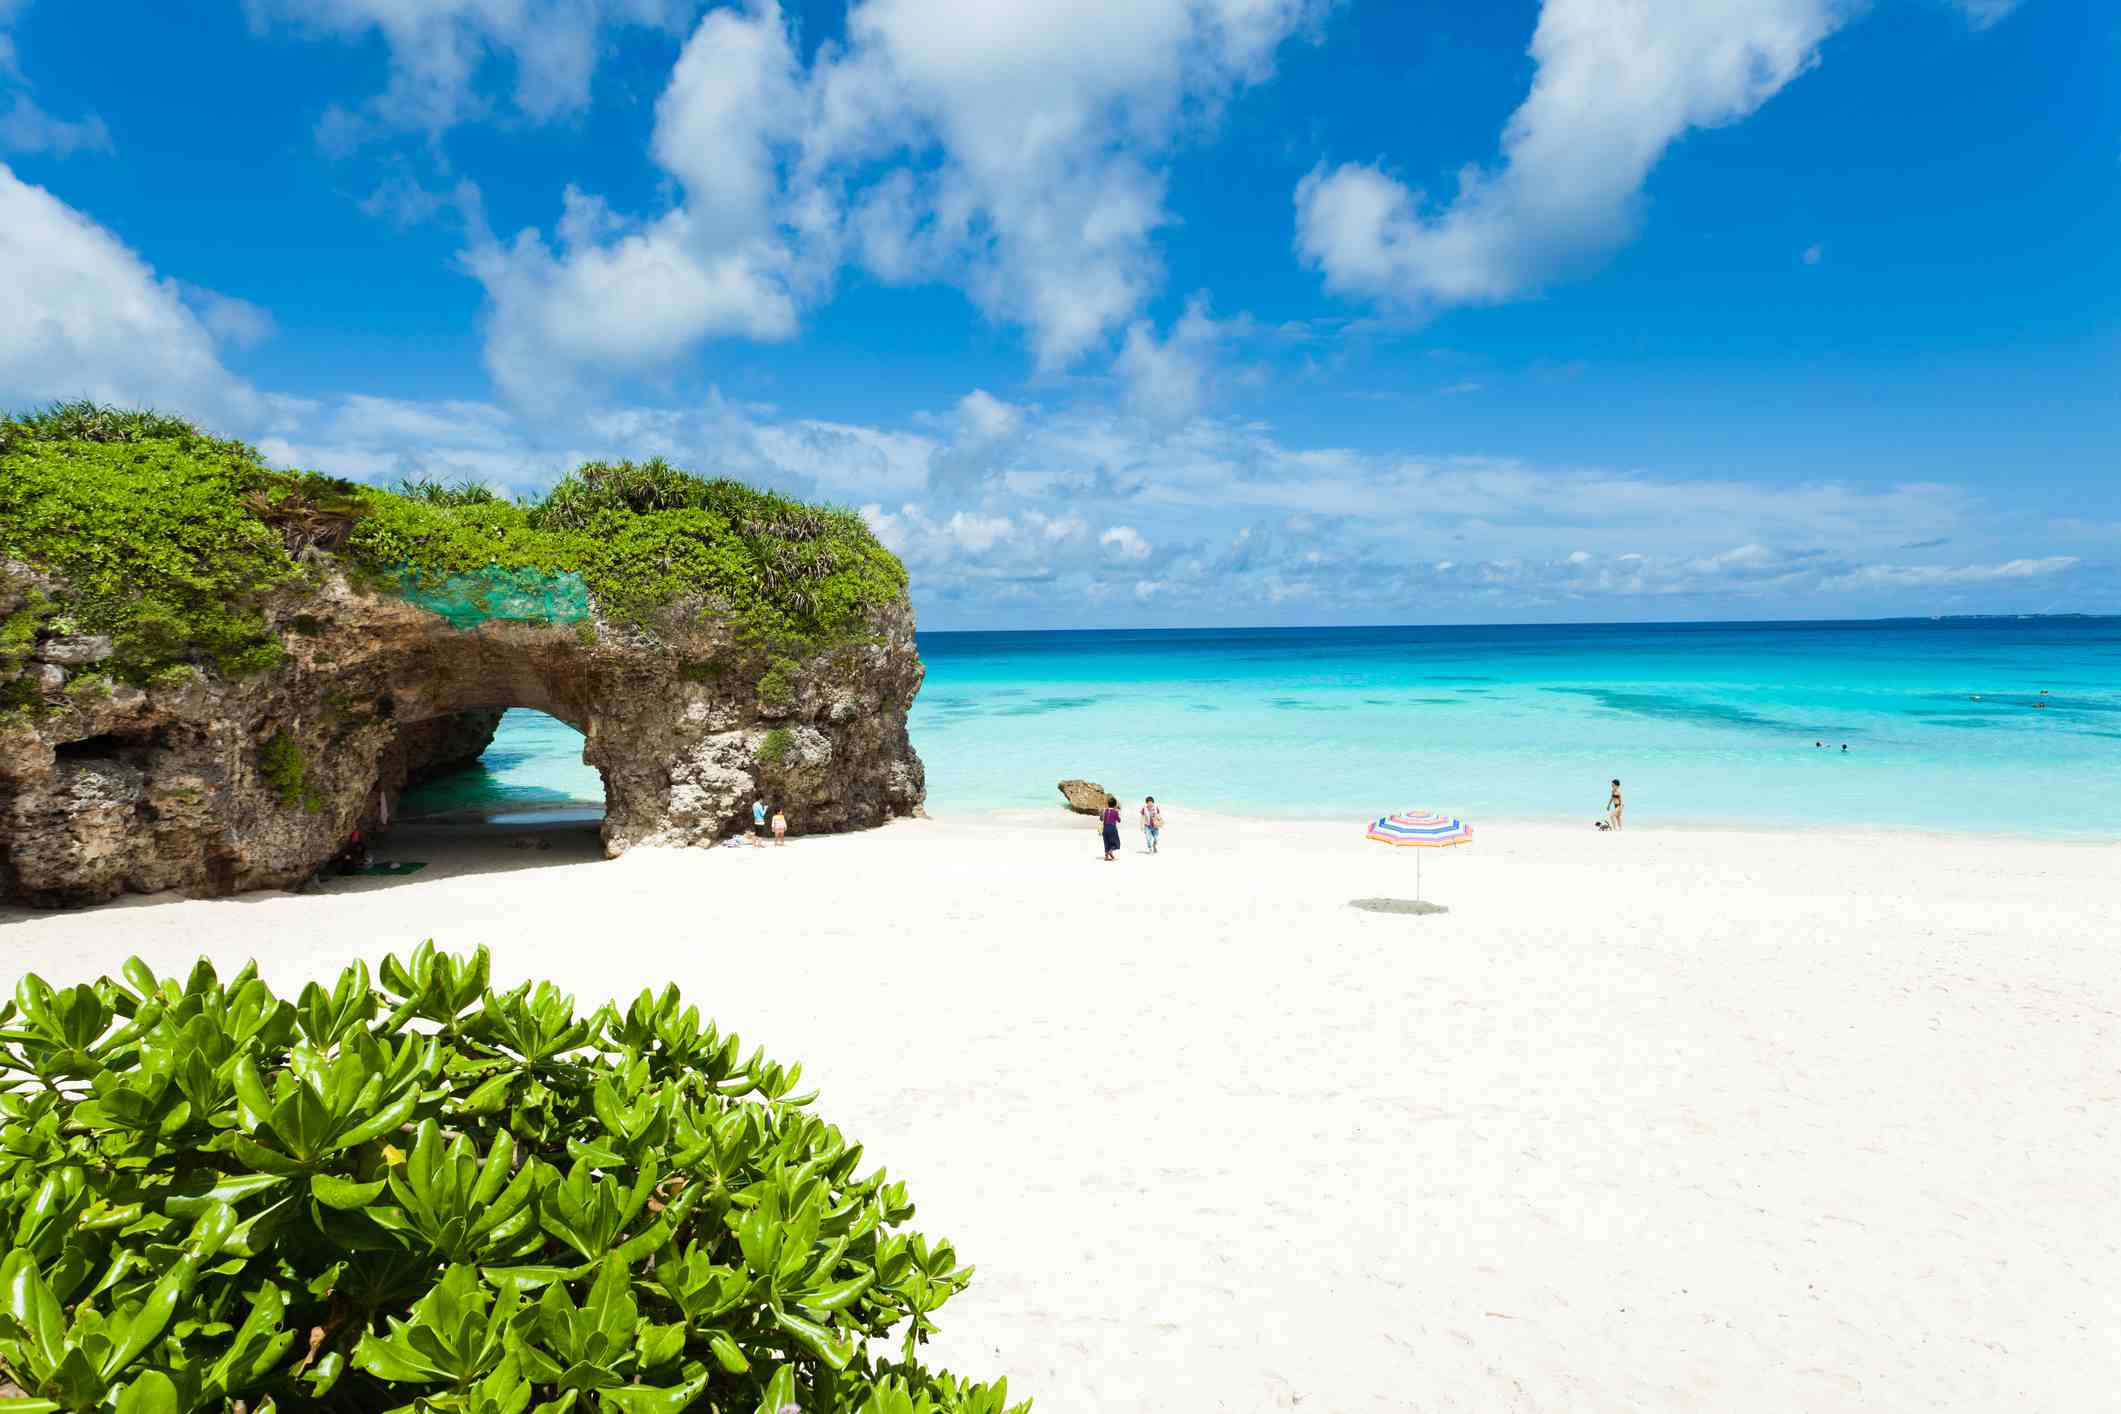 Tropisches Insel Strand-Paradies, Okinawa, Japan